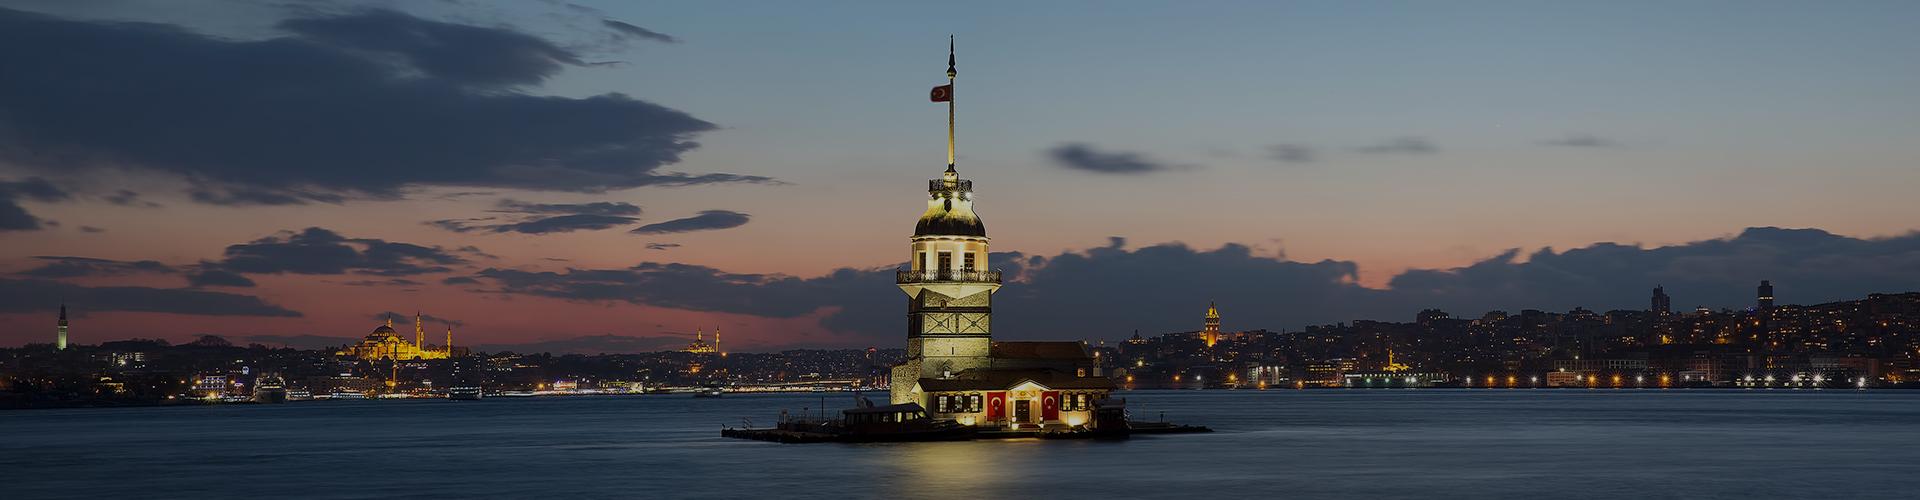 Landmark photograph of Turkey